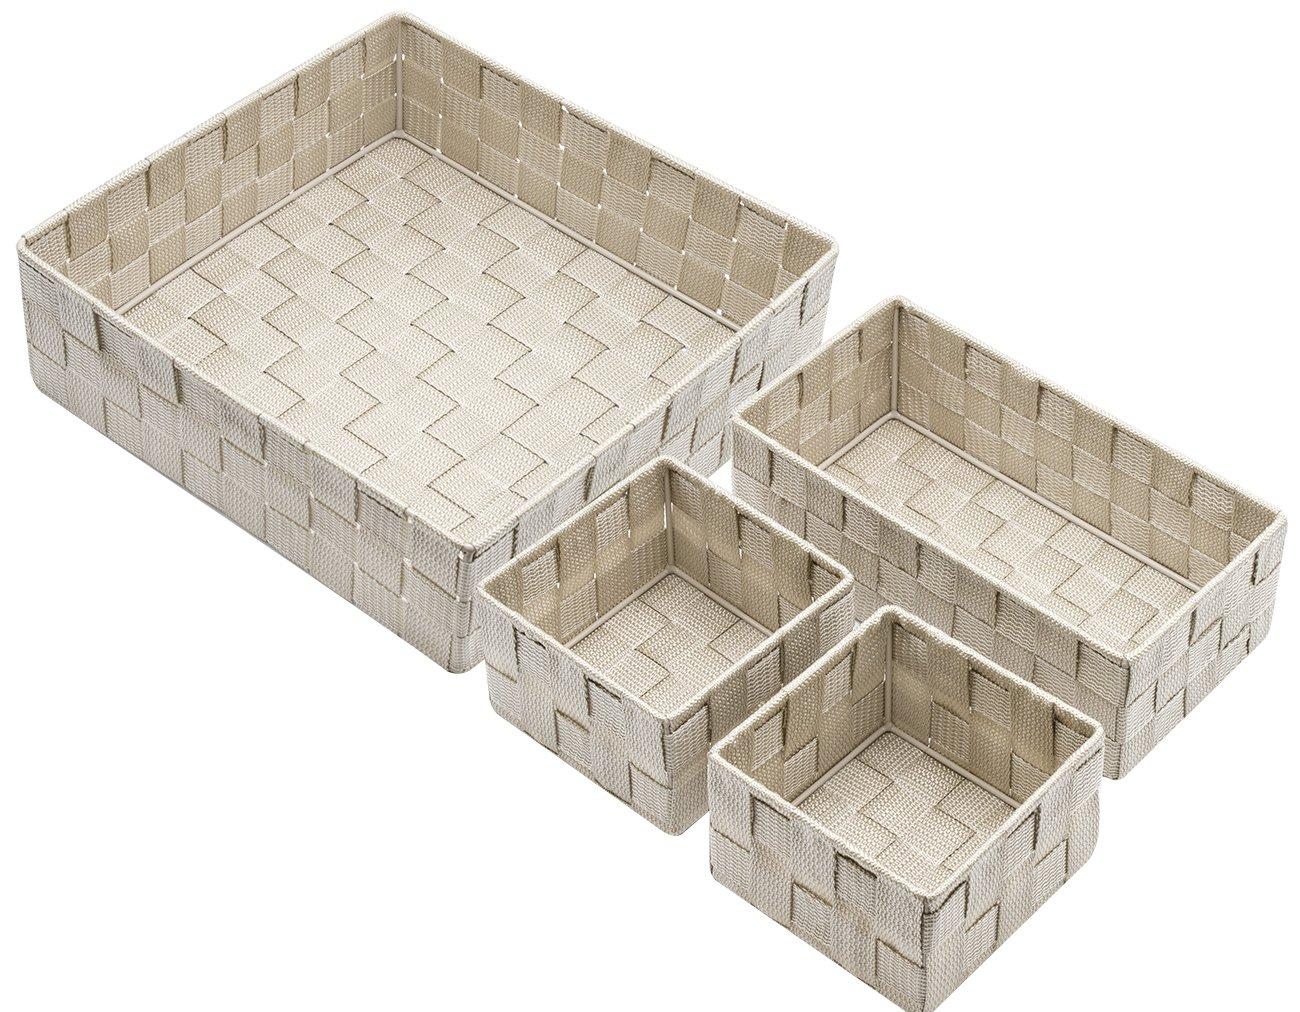 WEV4-GRYPATA Woven Basket Set - 4 Piece, Gray Pattern Sorbus Storage Box Woven Basket Bin Container Tote Cube Organizer Set Stackable Storage Basket Woven Strap Shelf Organizer